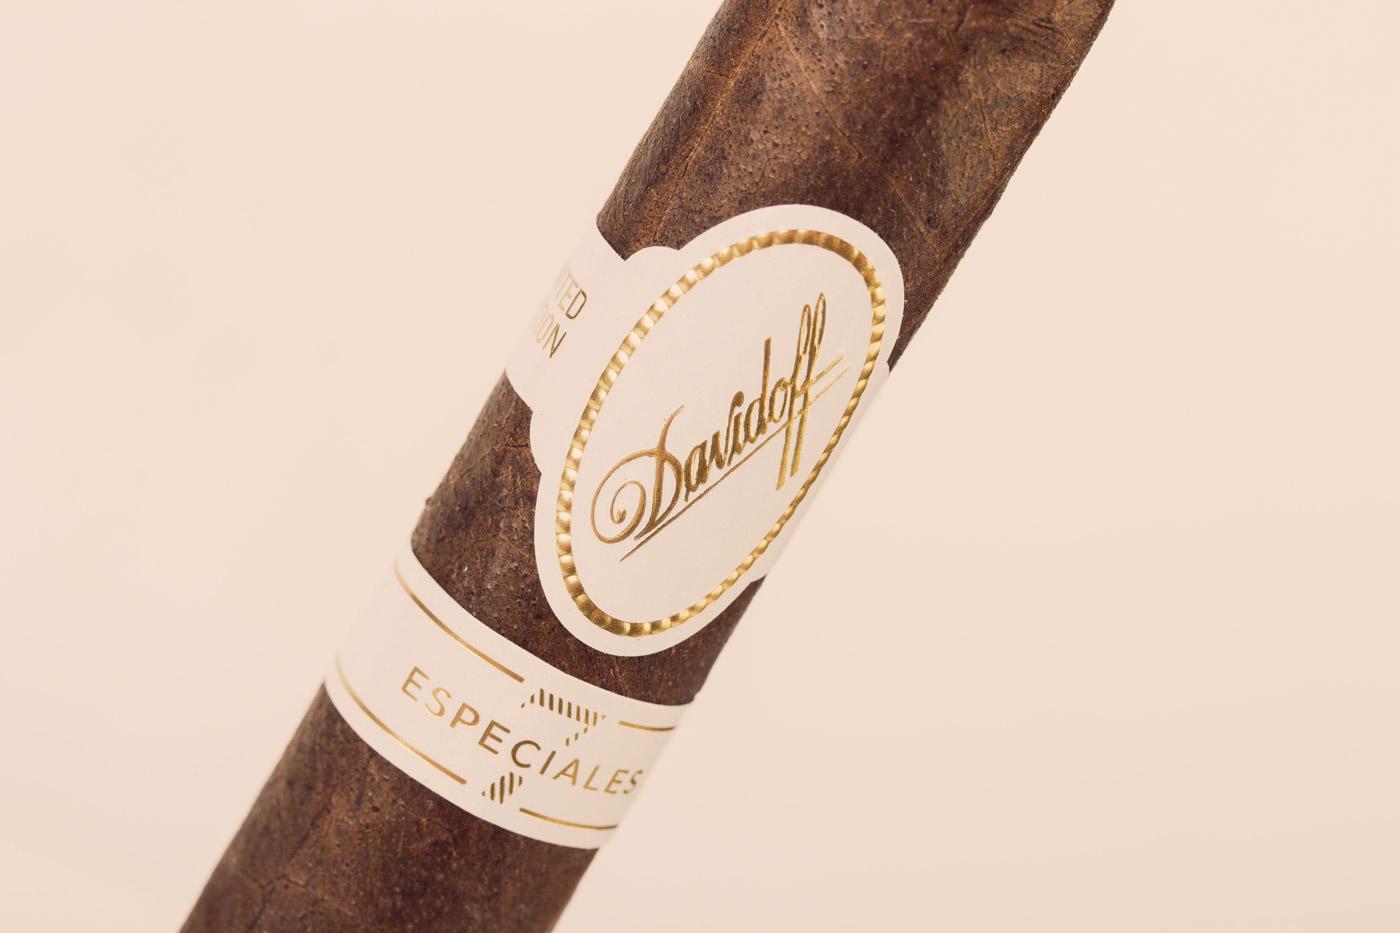 Davidoff Robusto Real Especiales 7 cigar review